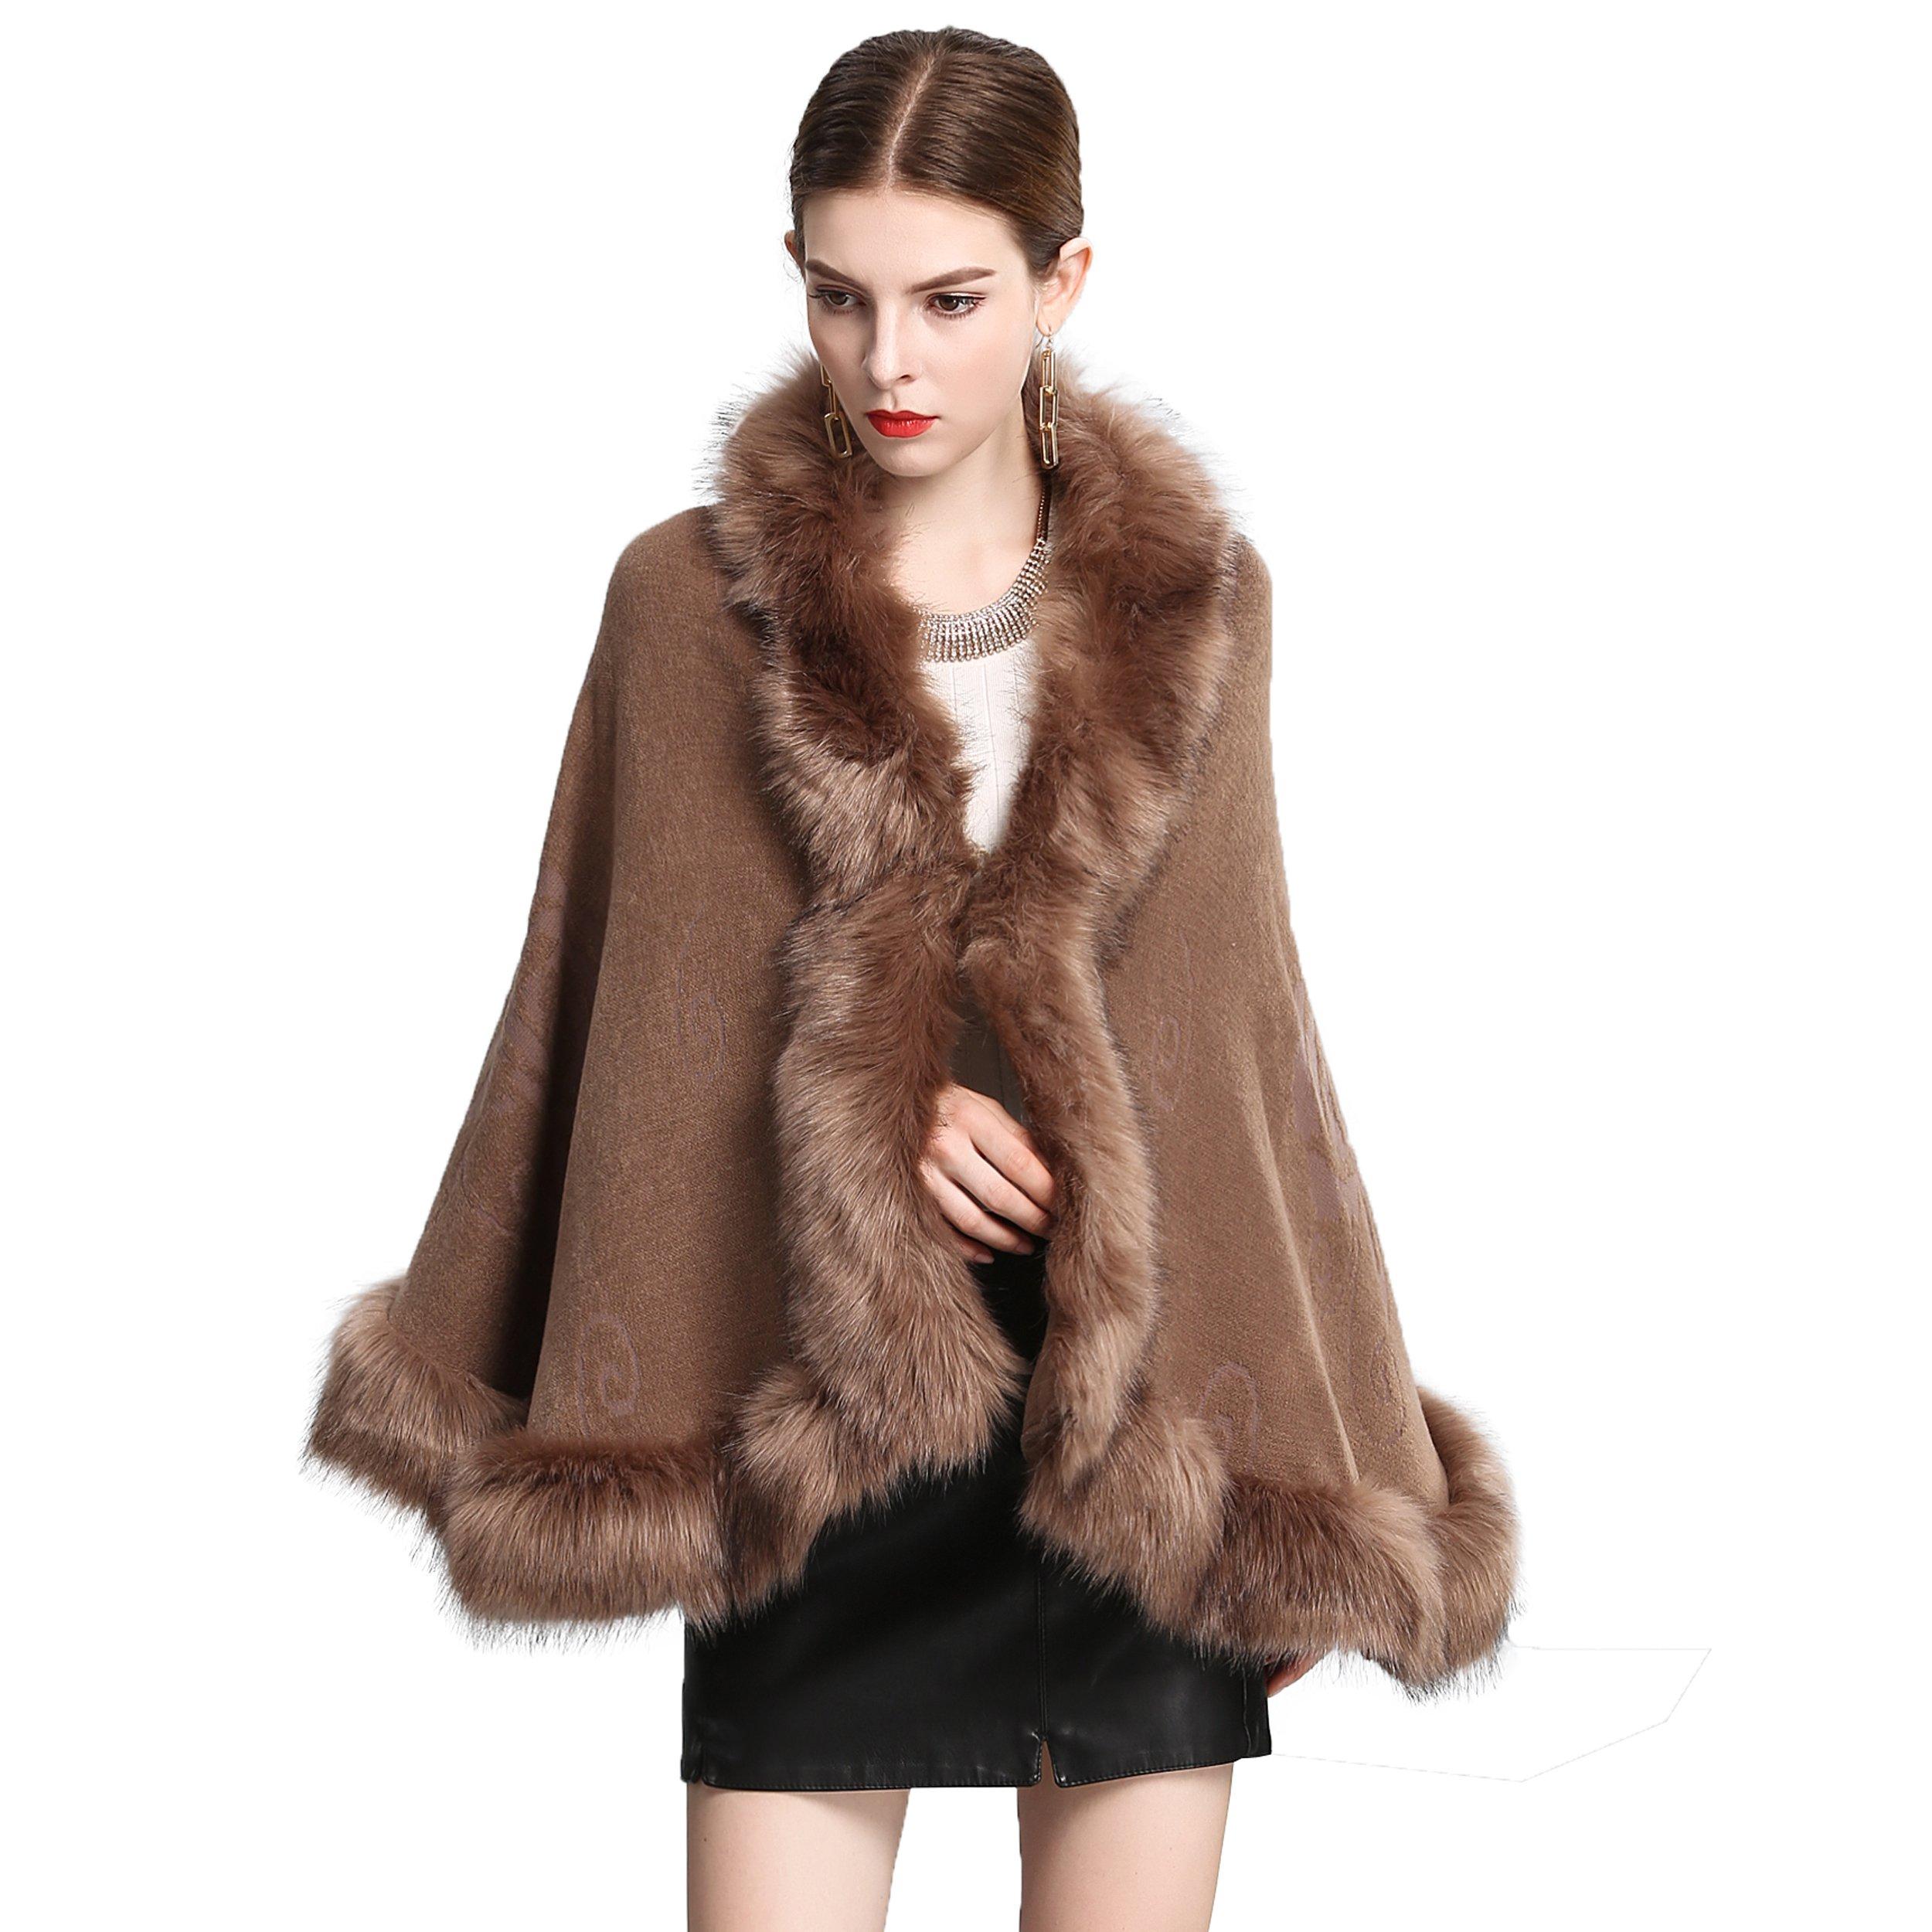 Caracilia Women Bridal Faux Fur Shawl Wraps Cloak Coat Sweater Khaki2